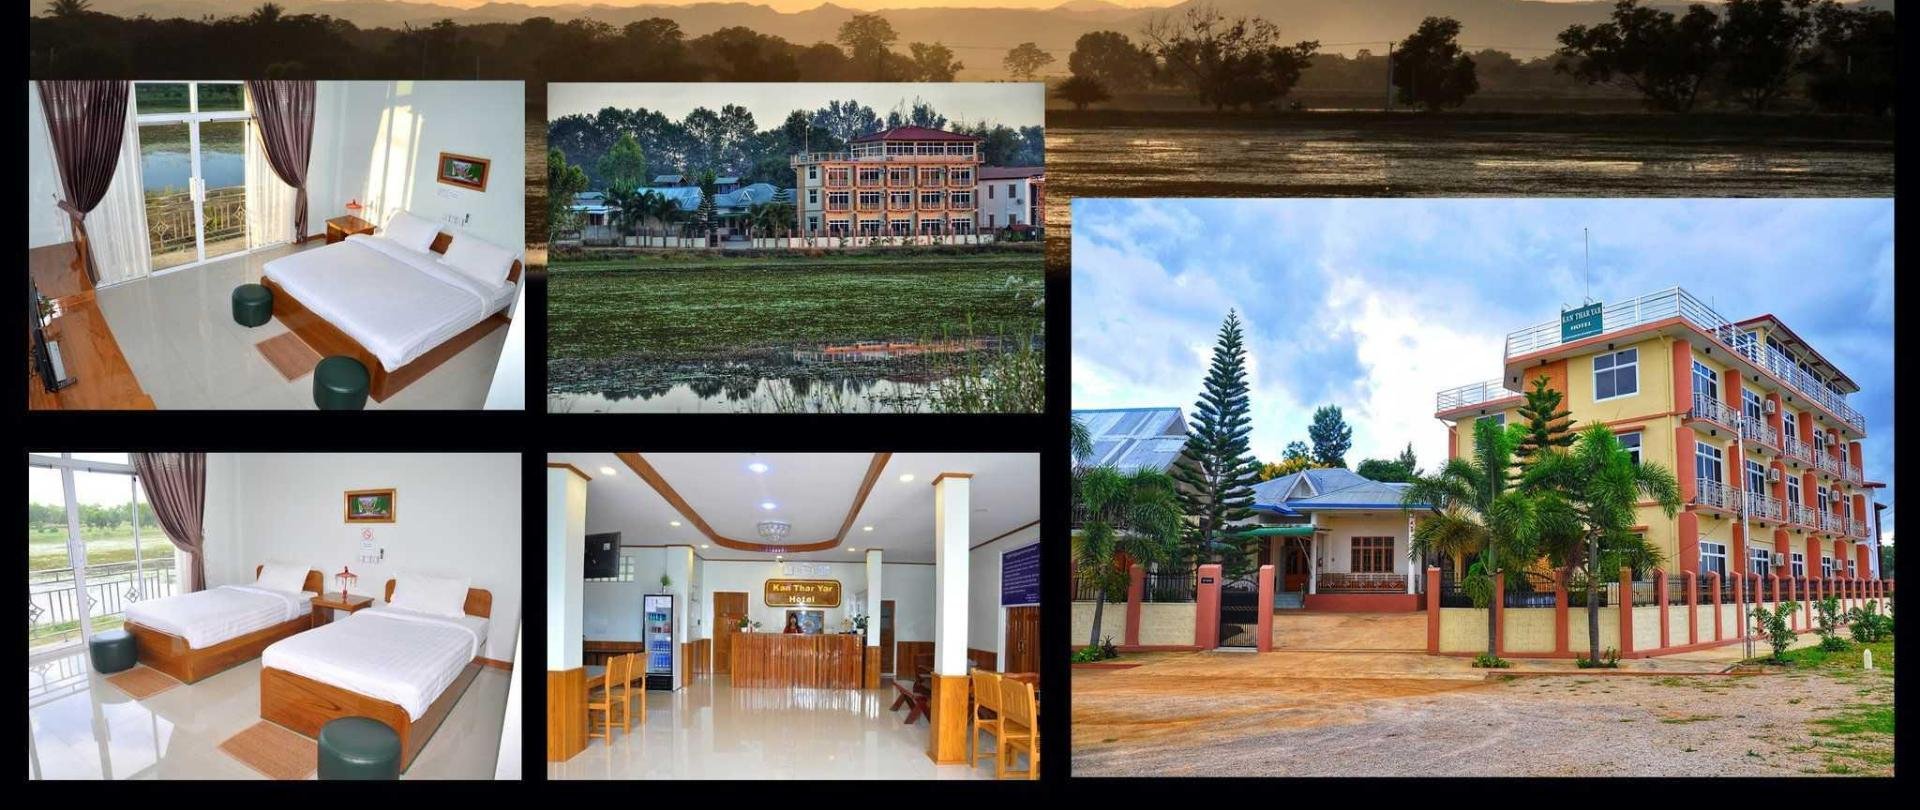 kan-thar-yar-hotel-1.jpg